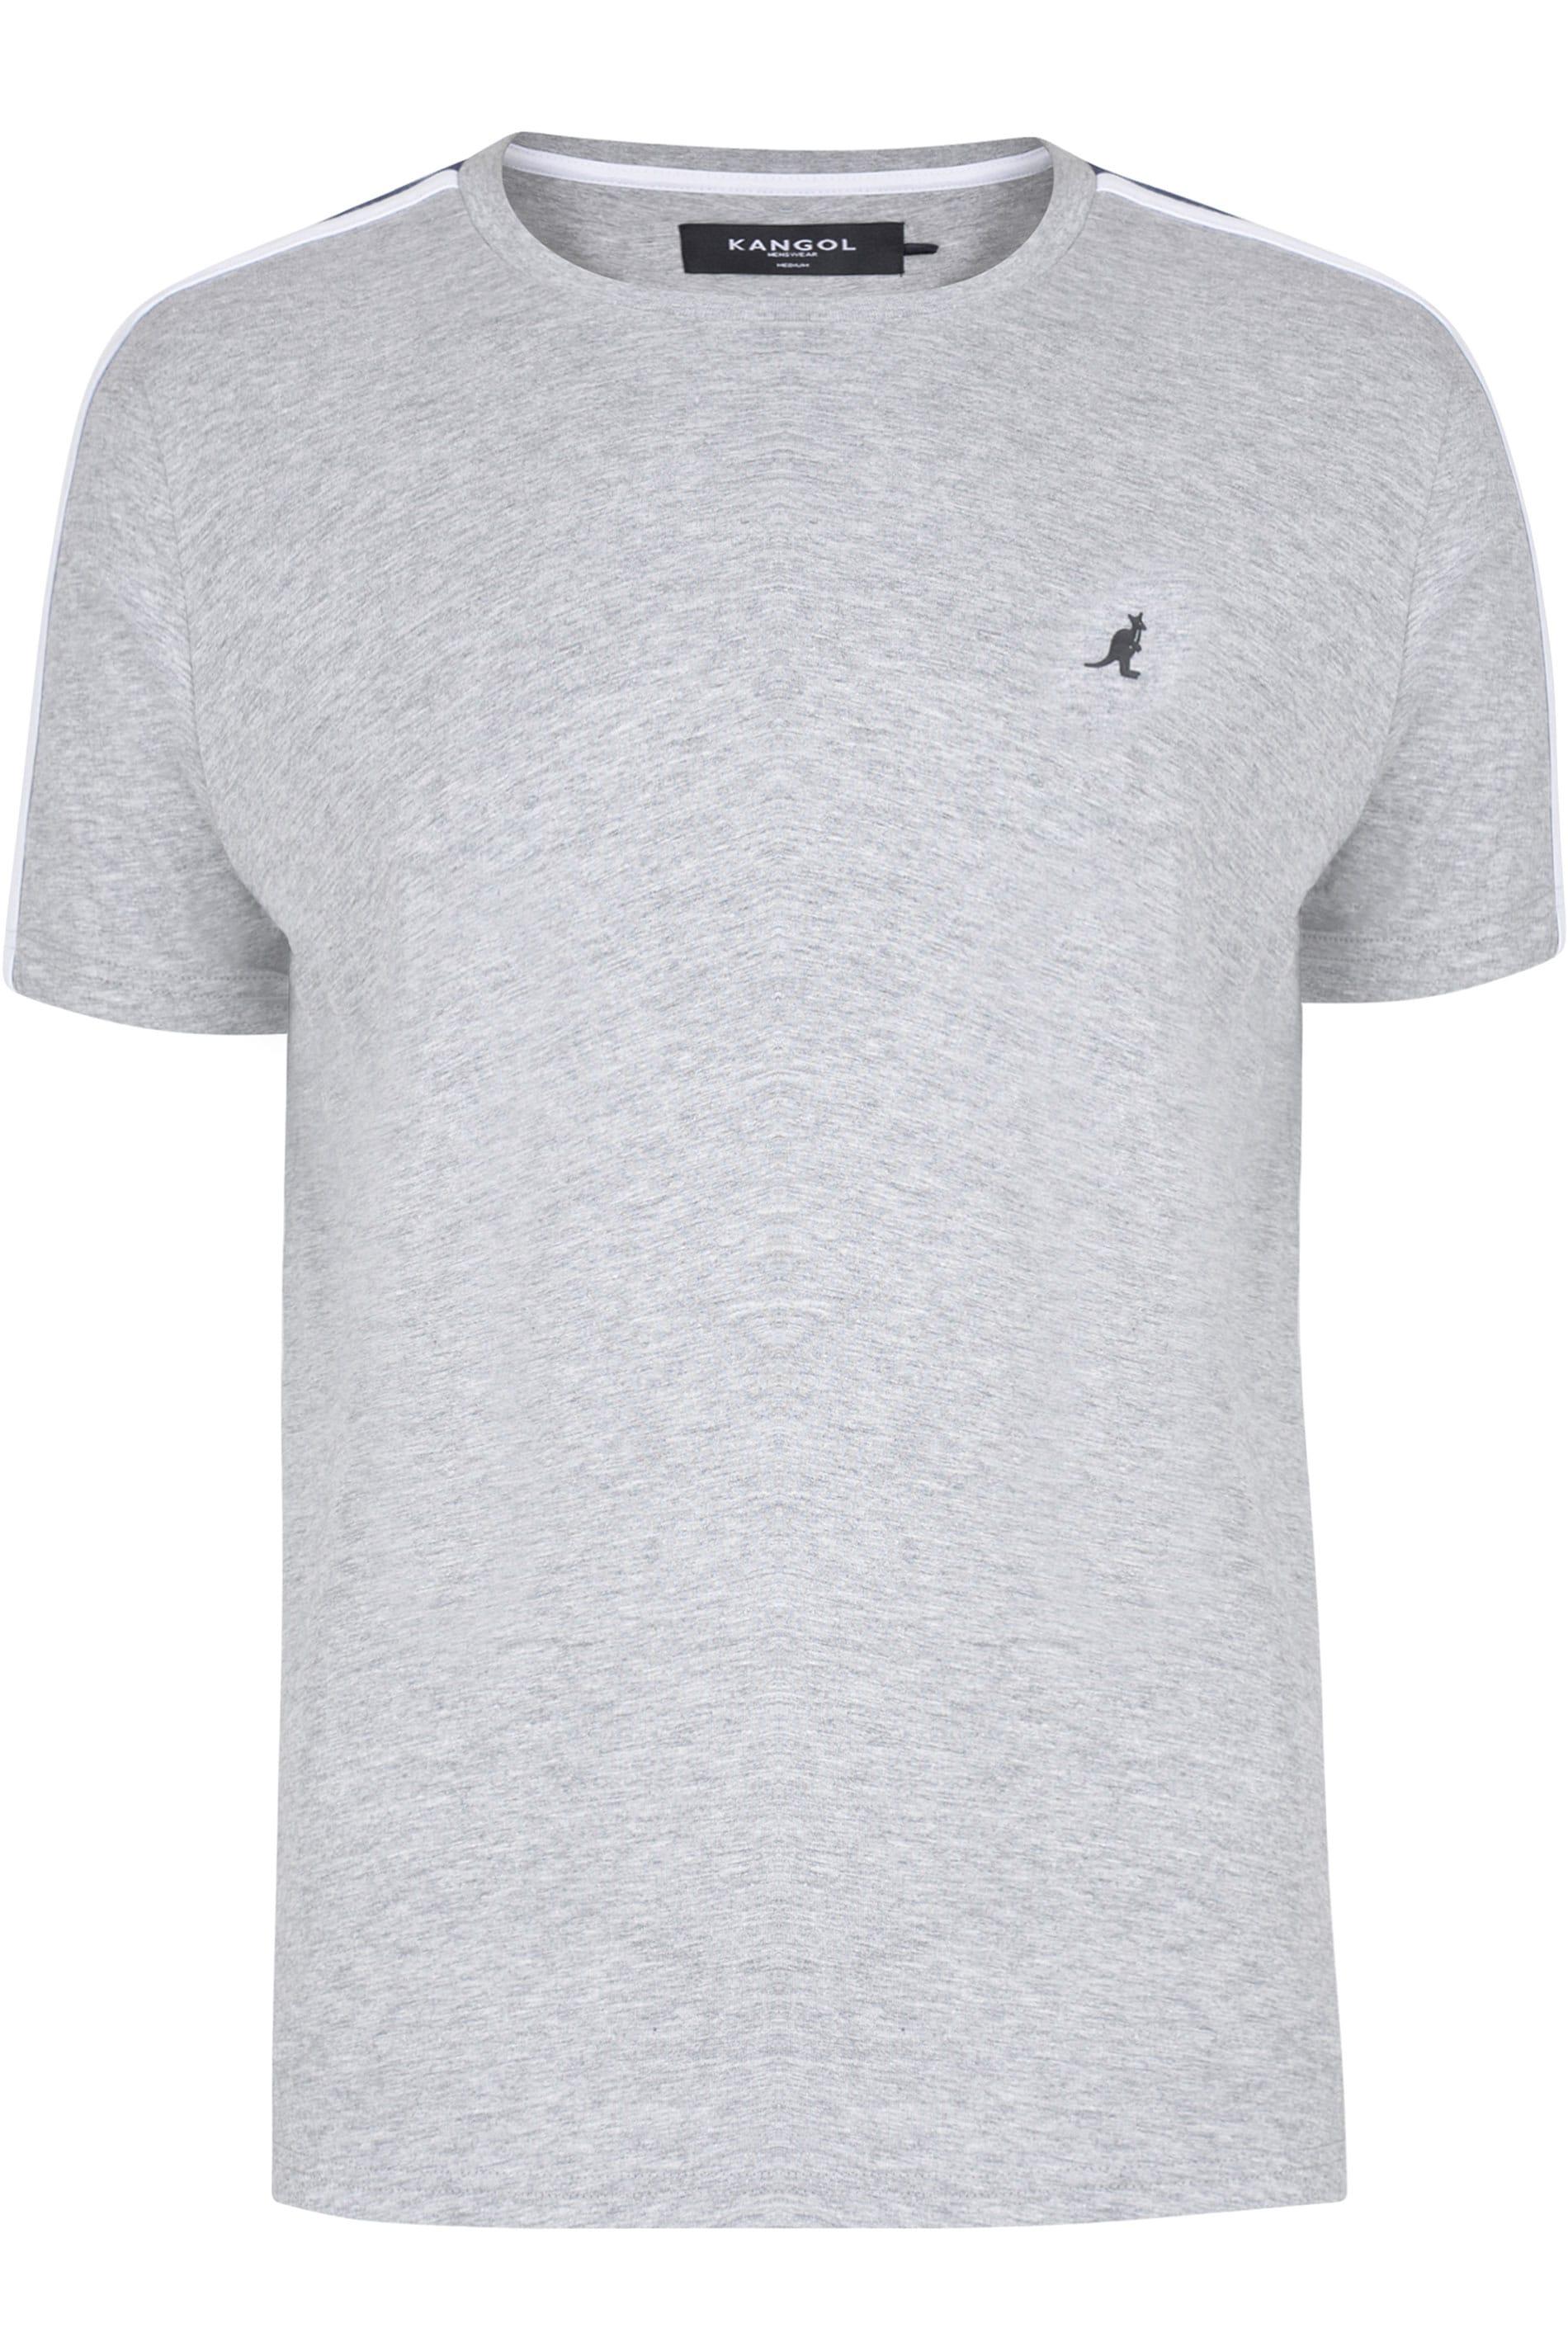 KANGOL Grey Marl Contrast Panel T-Shirt